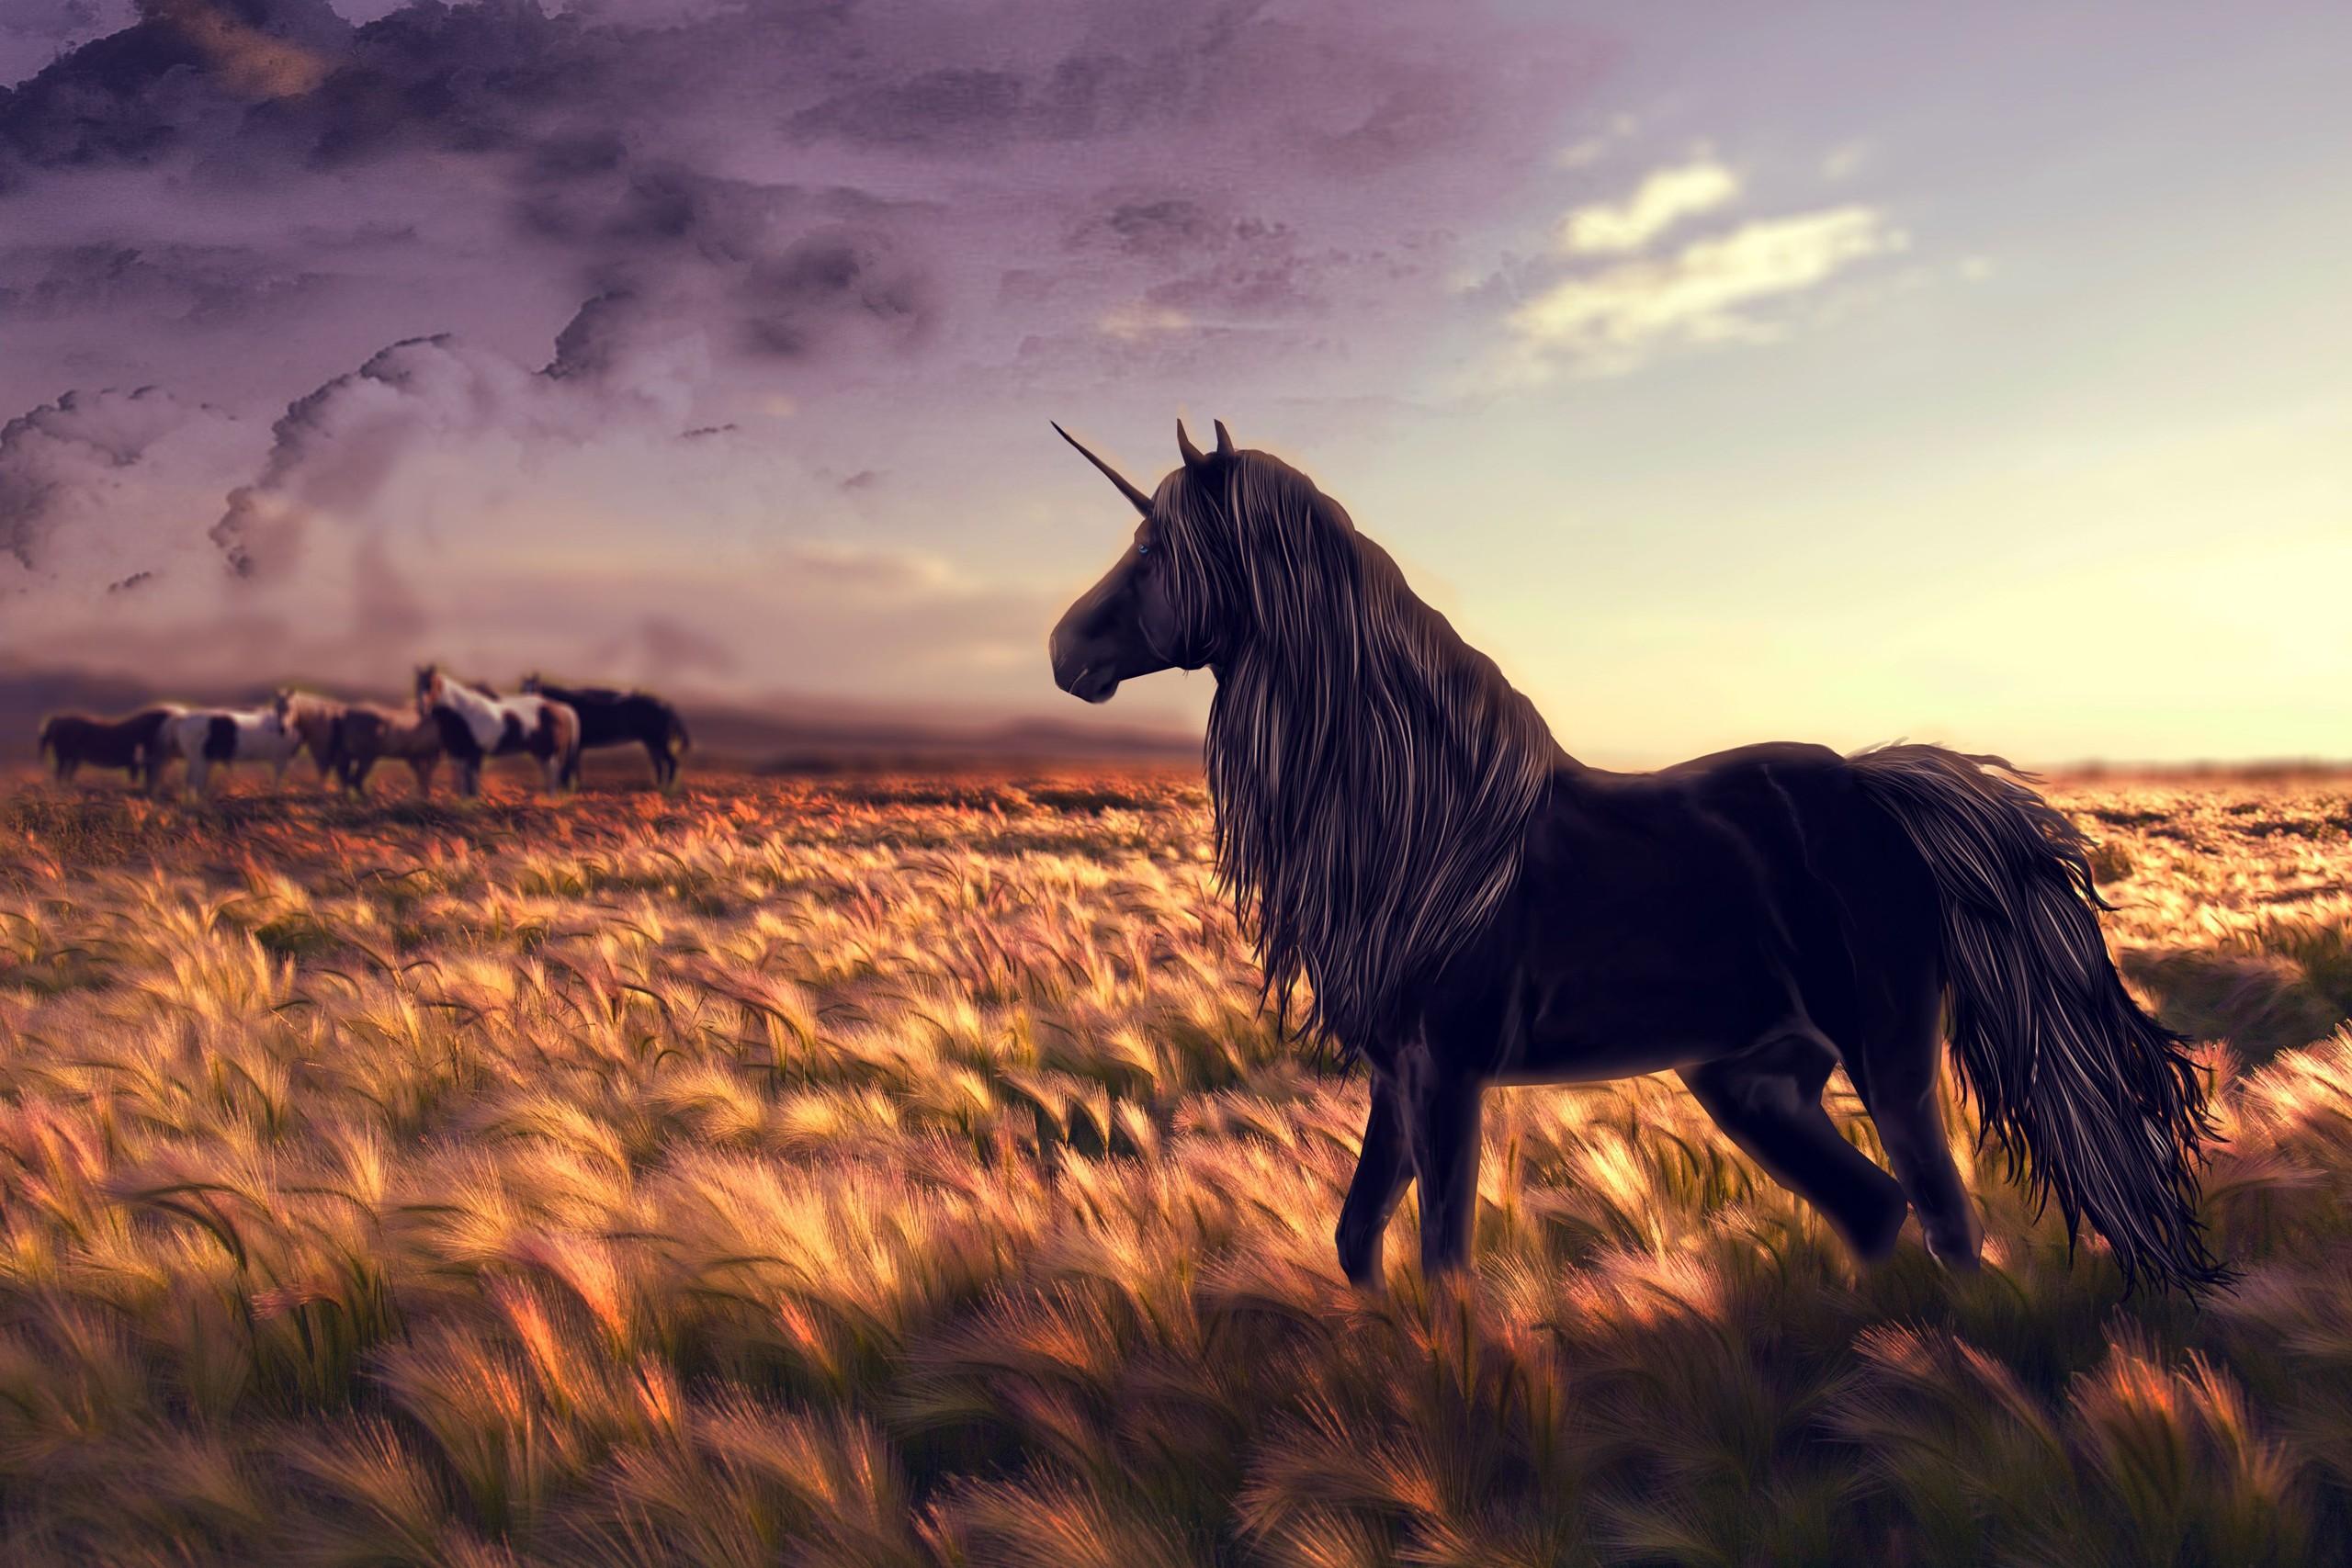 Black Unicorn HD Desktop Wallpaper   New HD Wallpapers 2560x1707